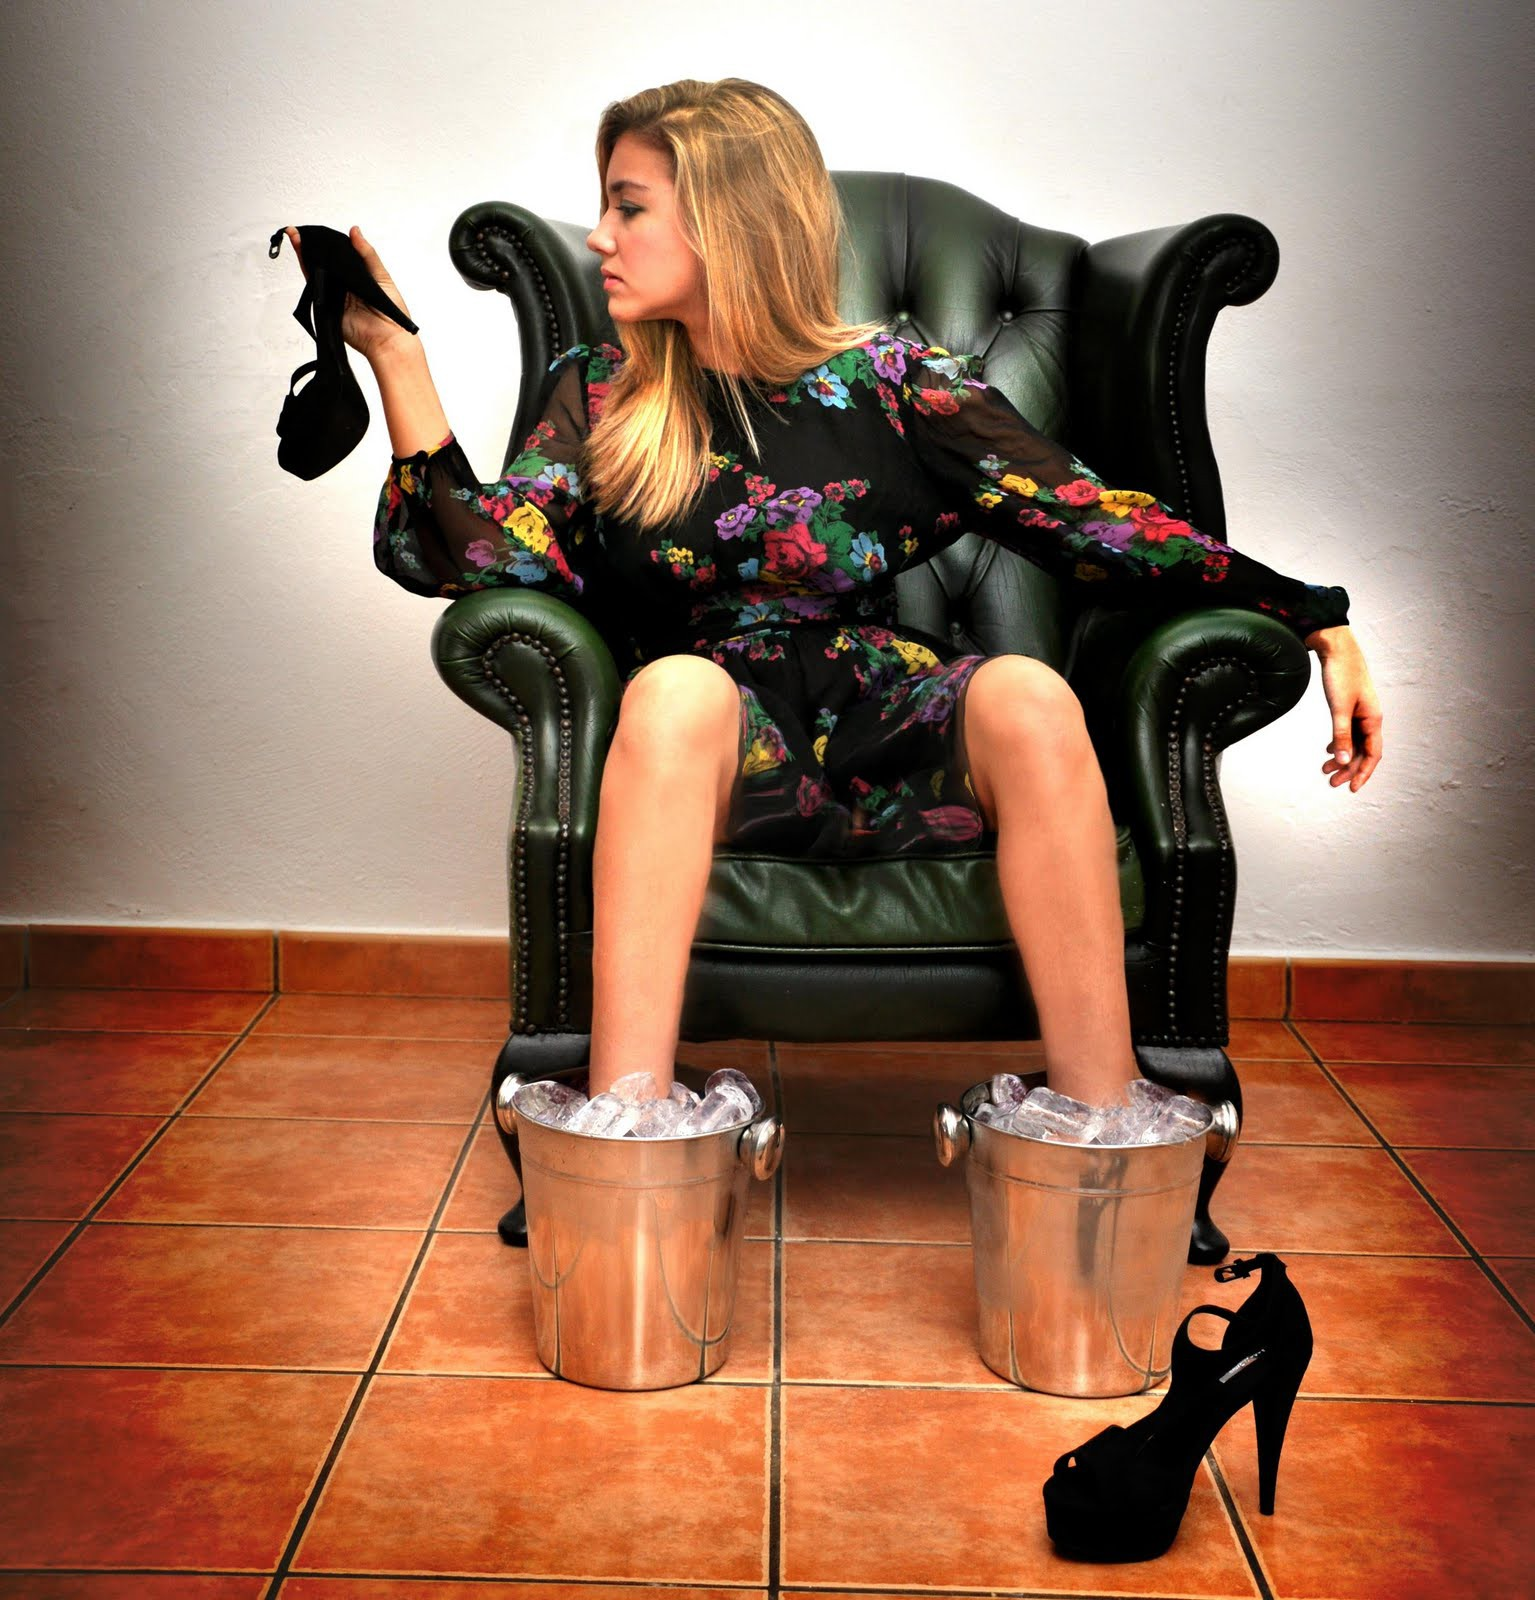 Она сексуальная девушка на каблуках